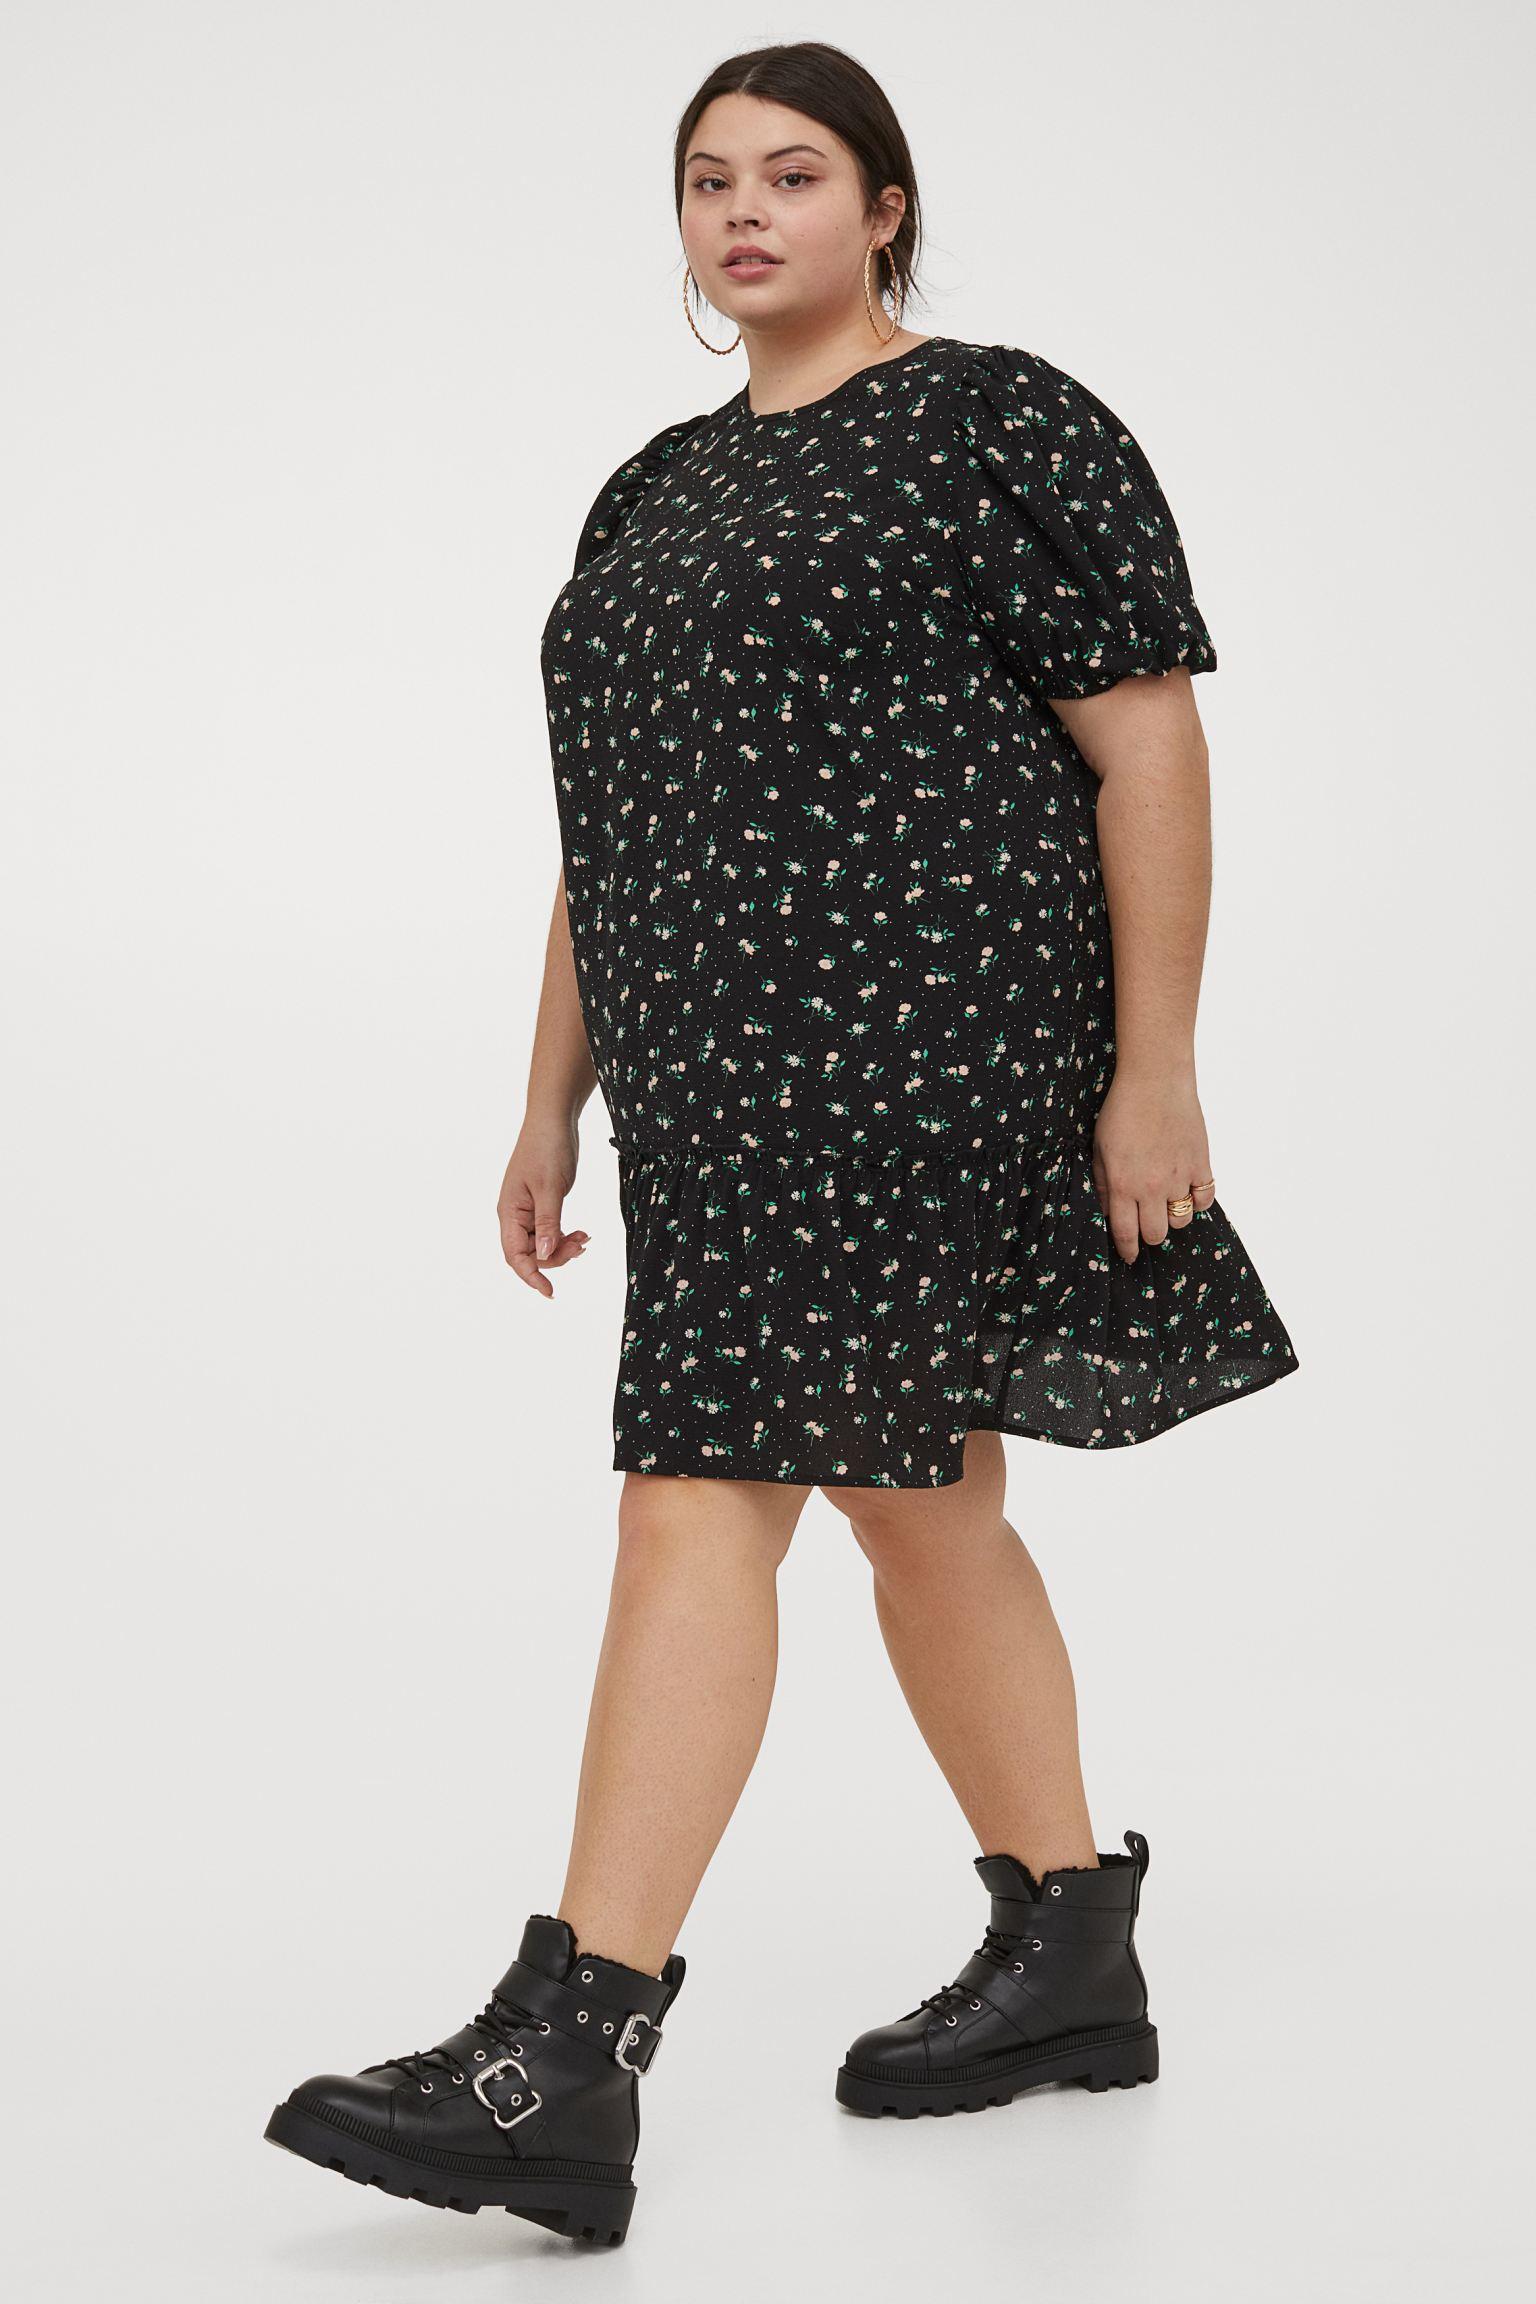 Vestido corto recto de tela con cuello redondo y manga corta abullonada